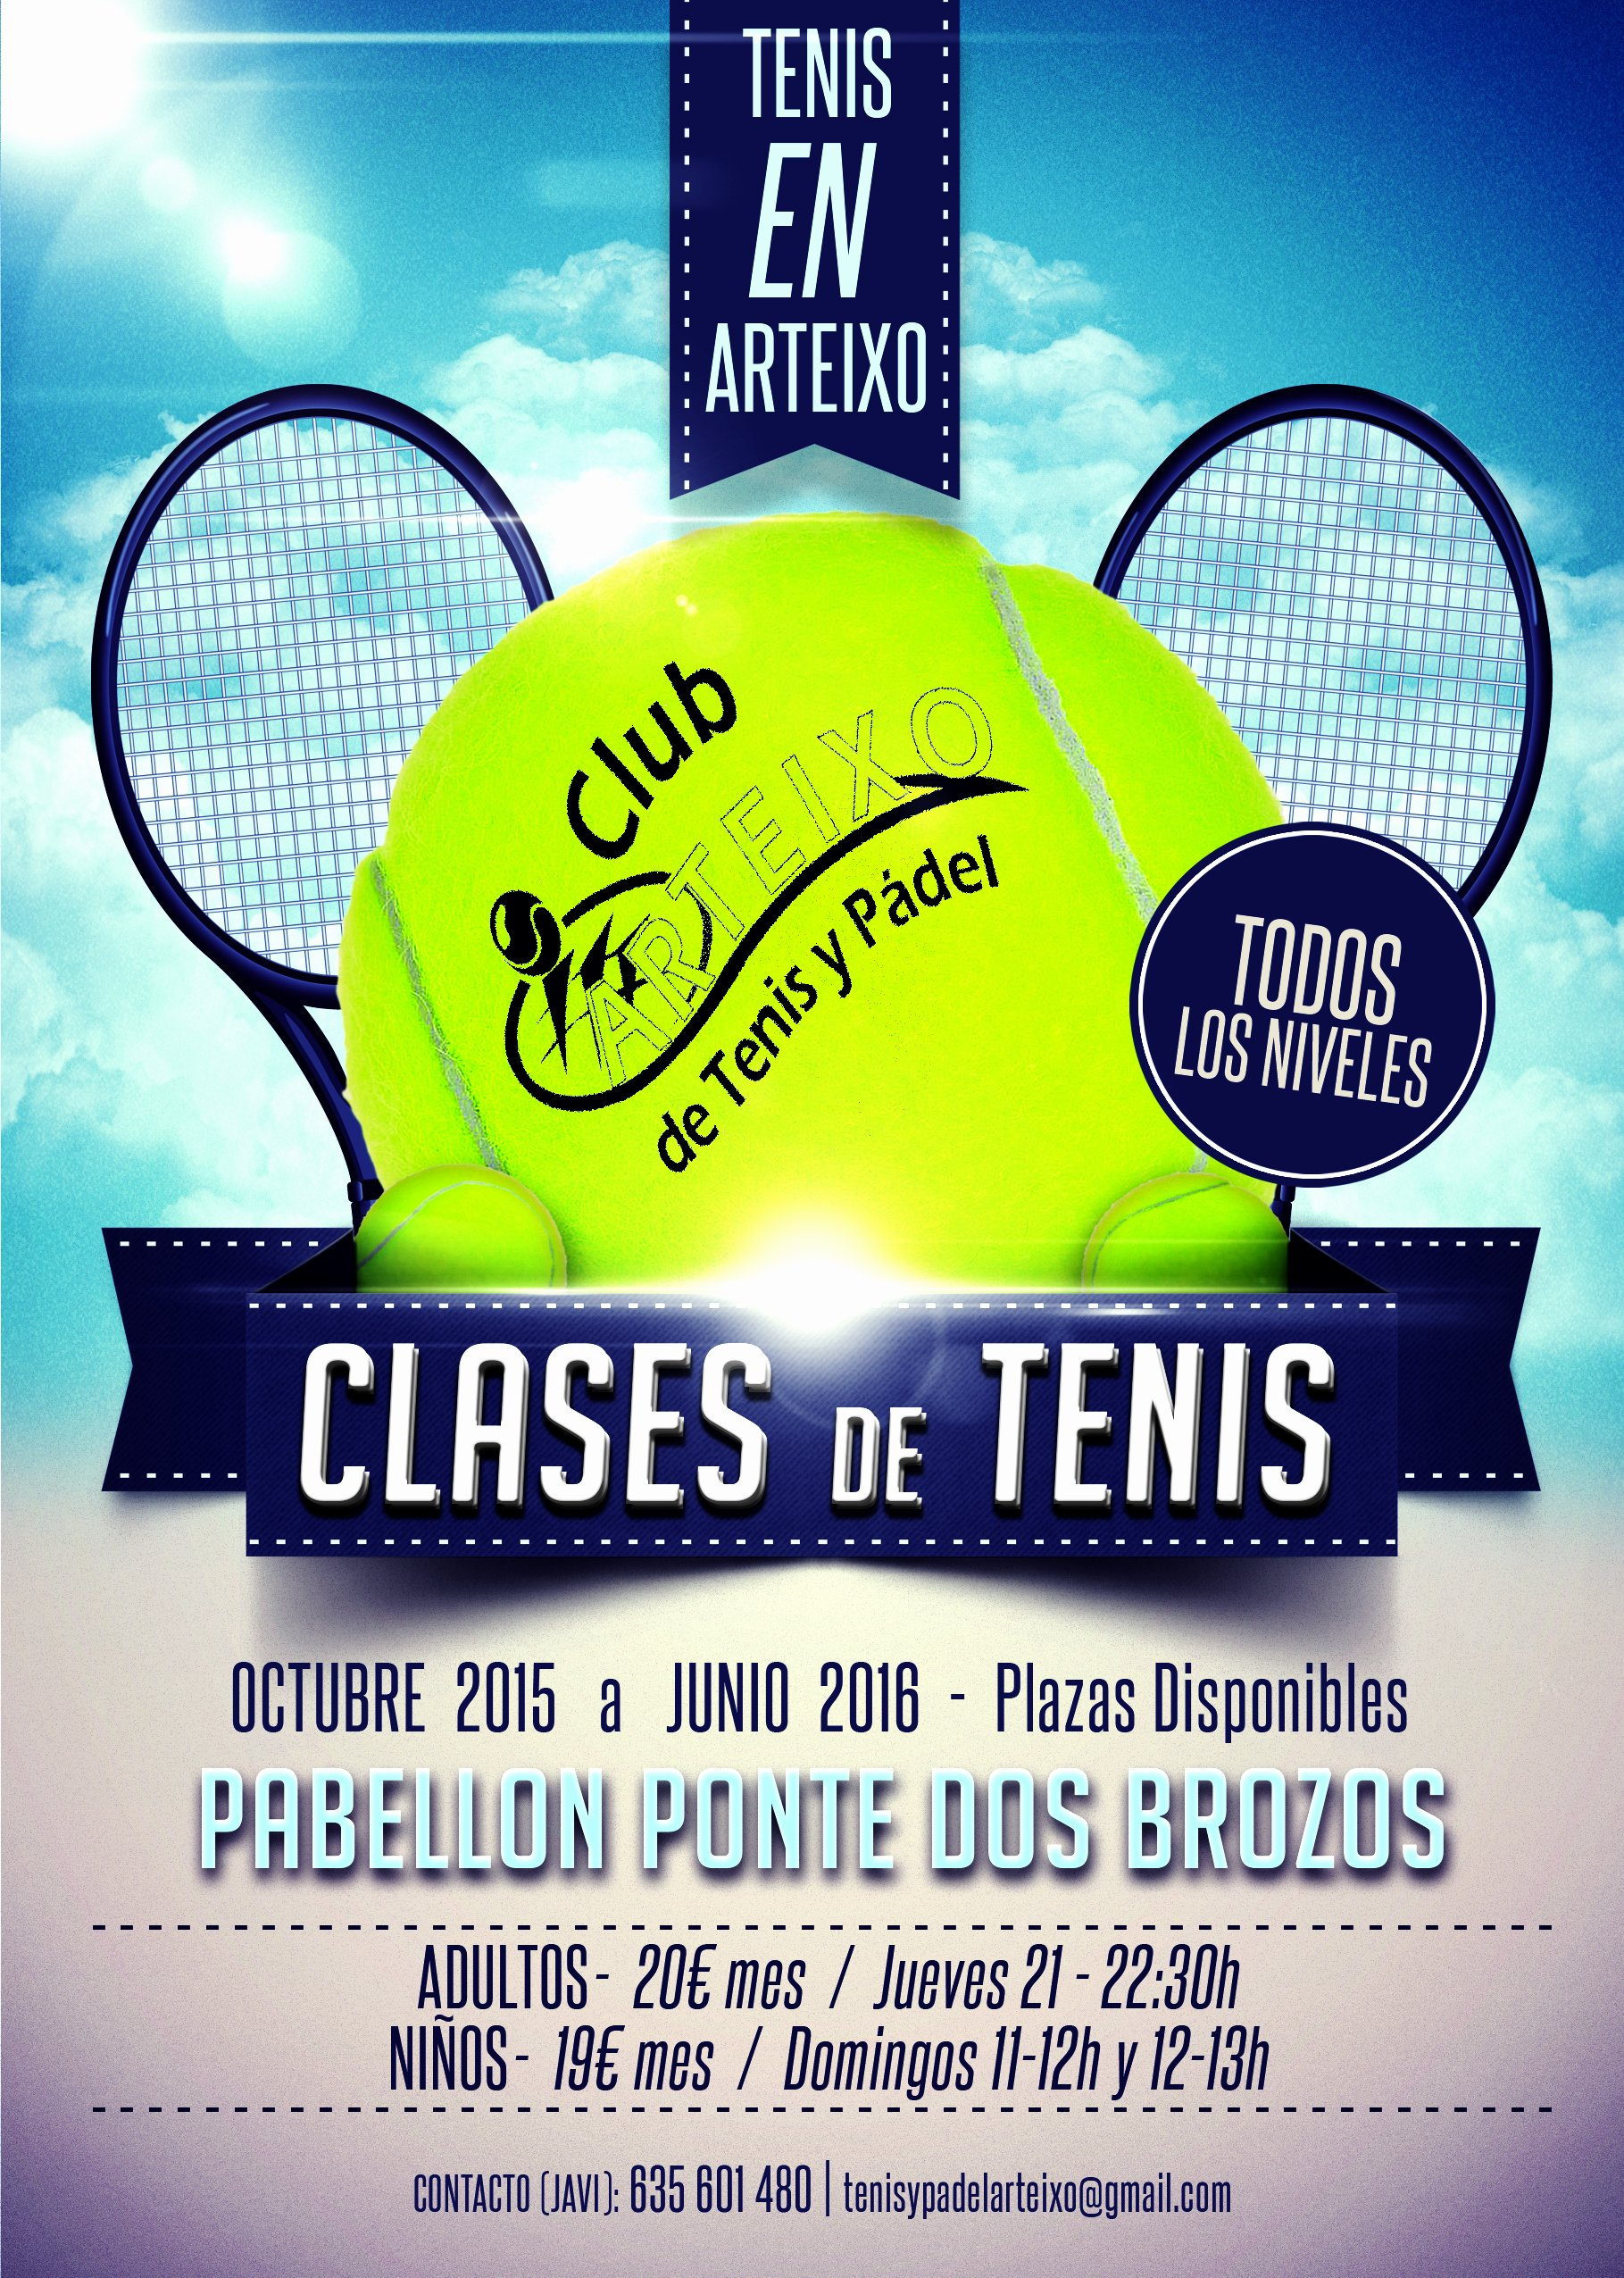 Tennis Flyer Template Free Luxury Club Tenis Y Padel Arteixo Coworking Arteixo